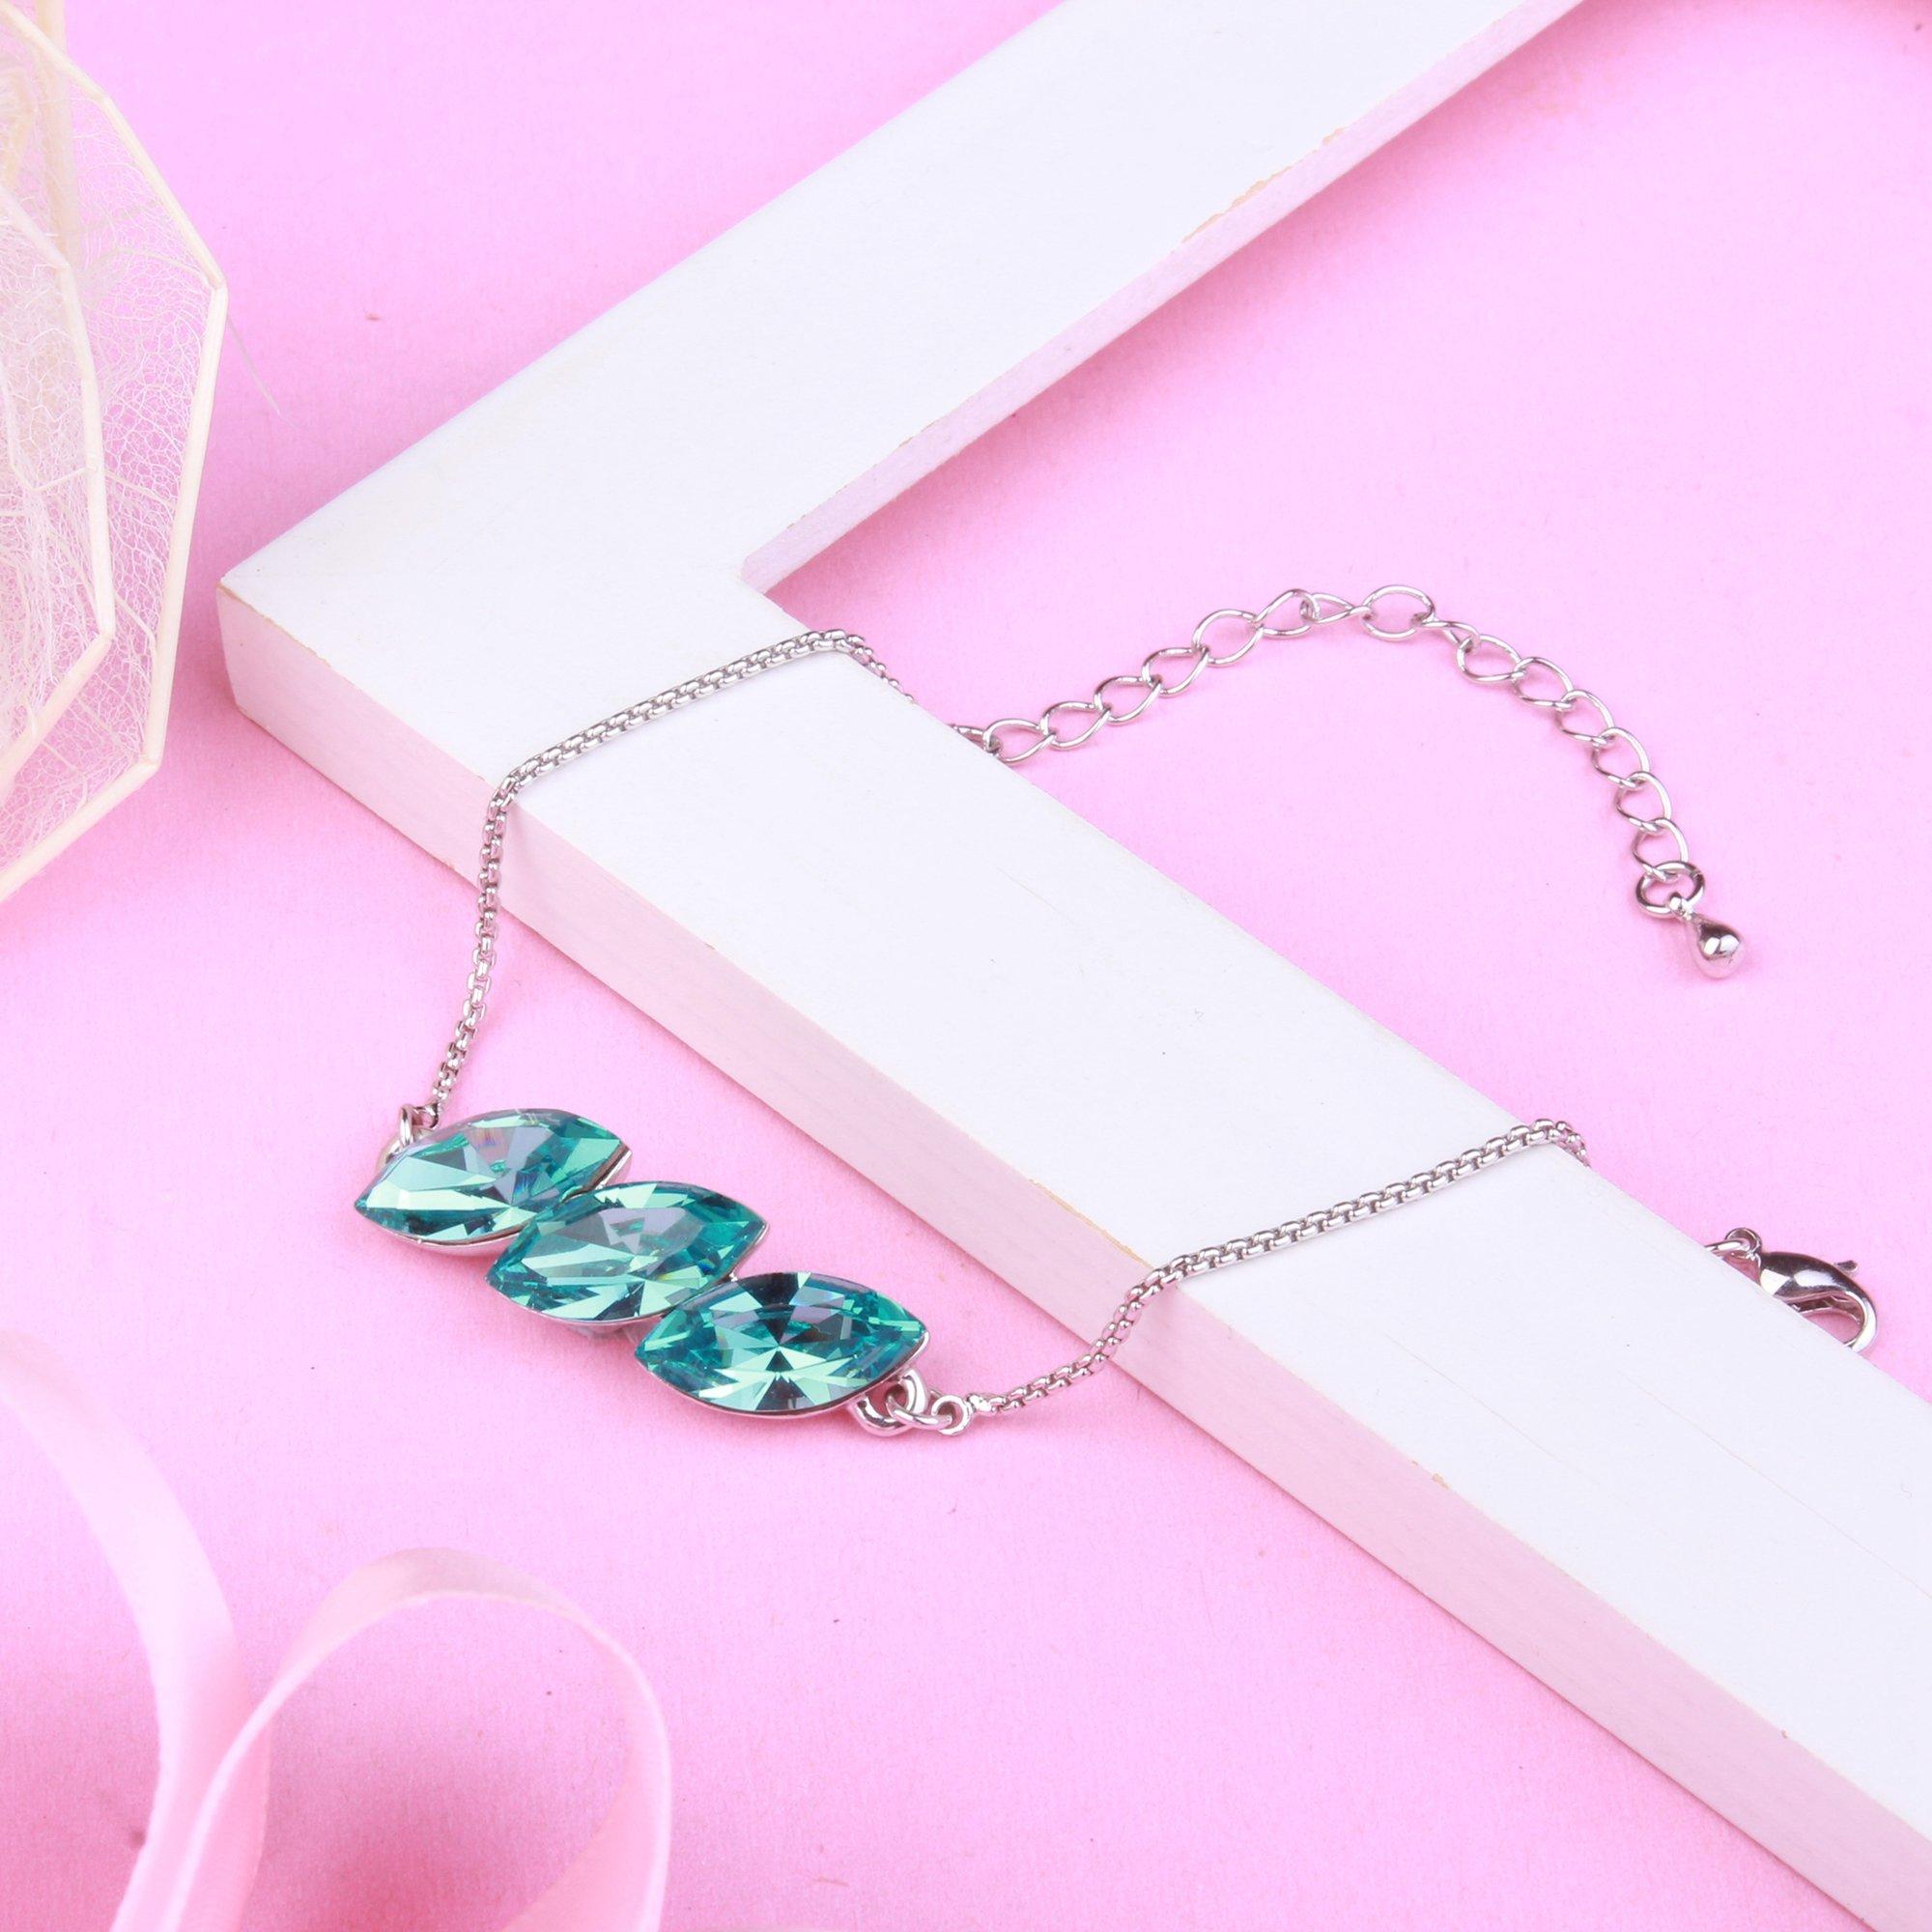 GEORGE · SMITH Wonderland Women Jewellery Turquoise Bracelet with Swarovski Crystal Wedding Birthday Gifts for her